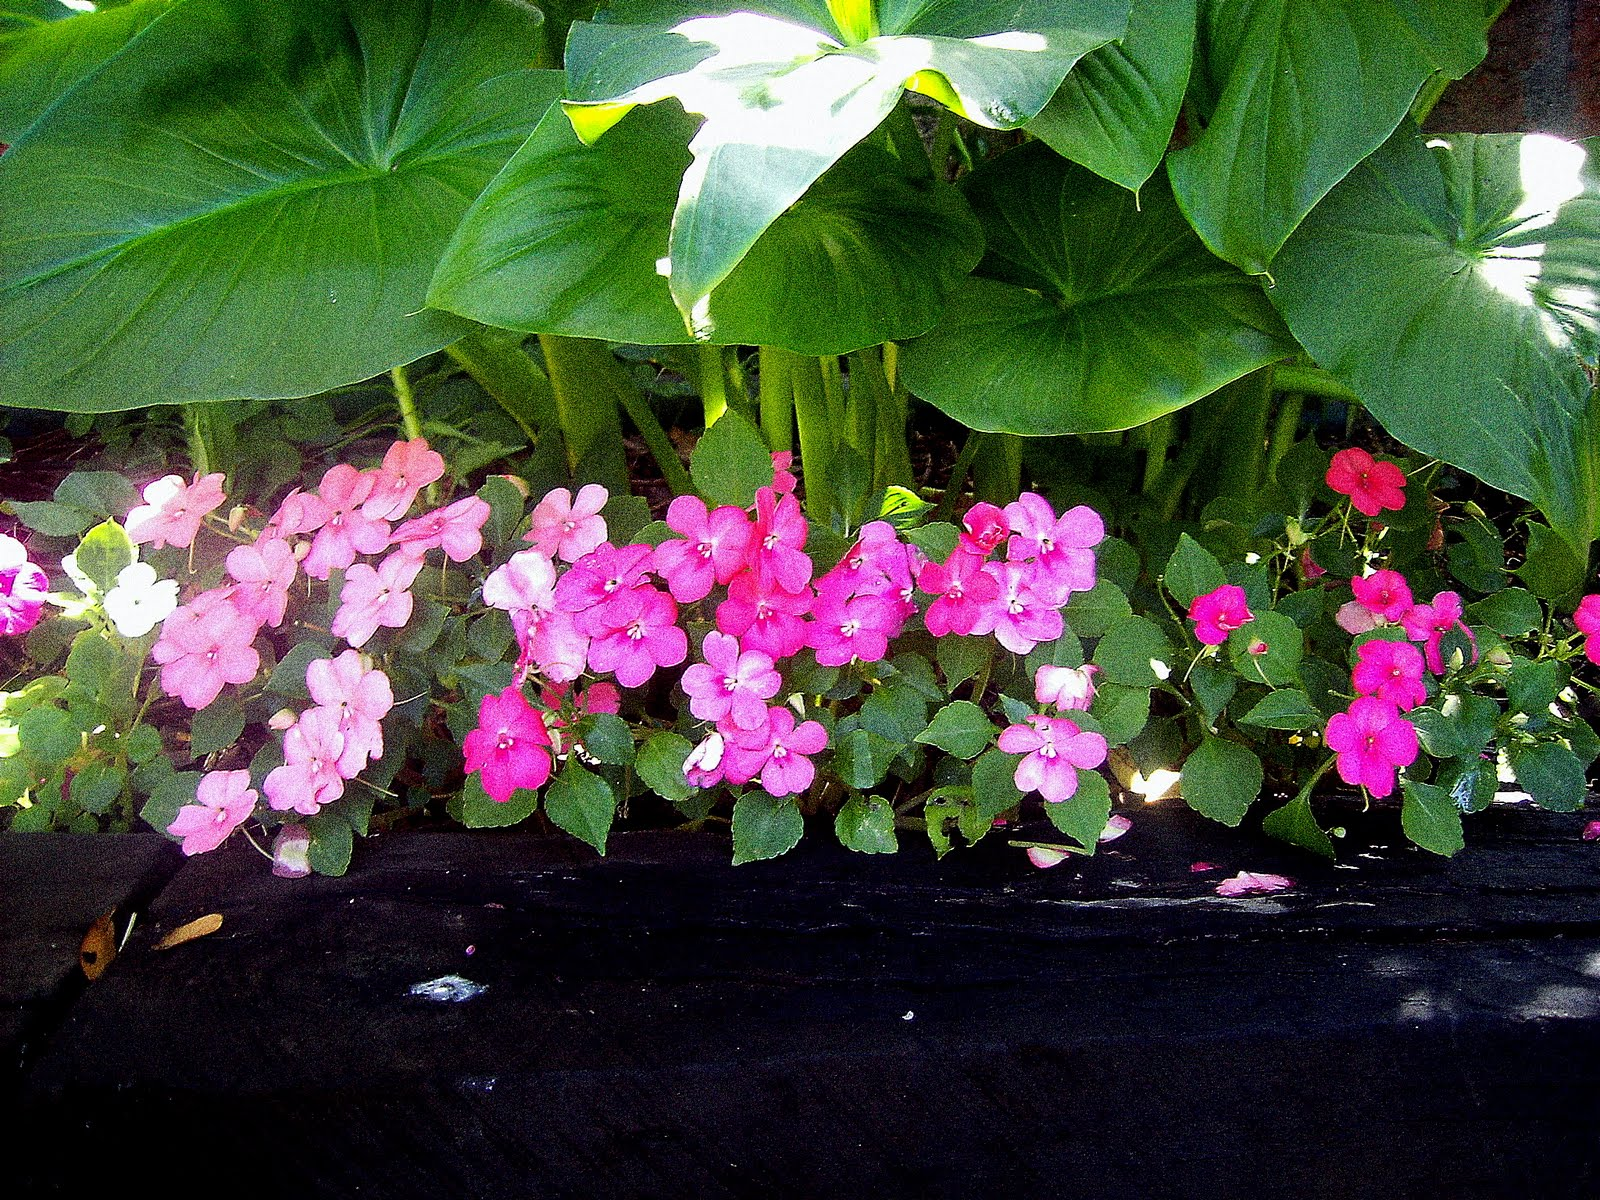 Greenberry 12 tips para 12 flores - Planta alegria del hogar ...